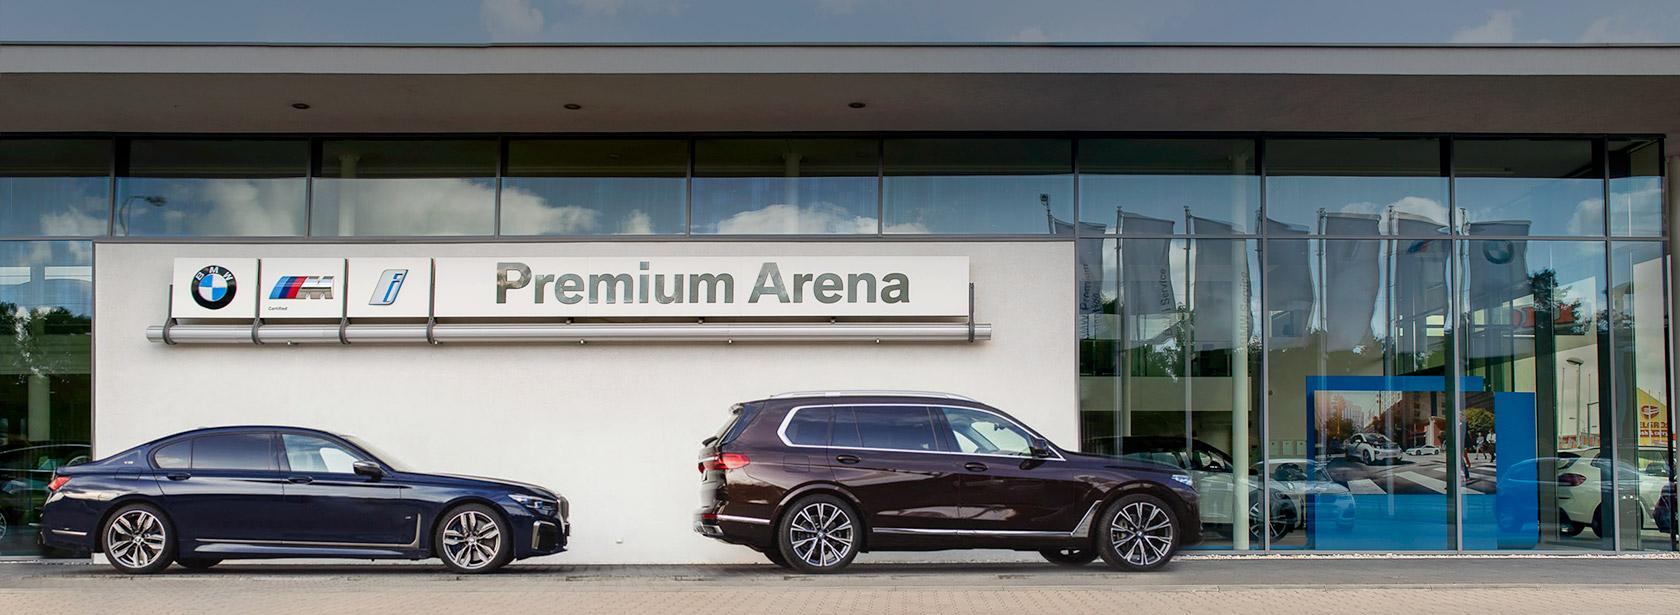 Salon Dealer BMW Premium Arena Łódź.